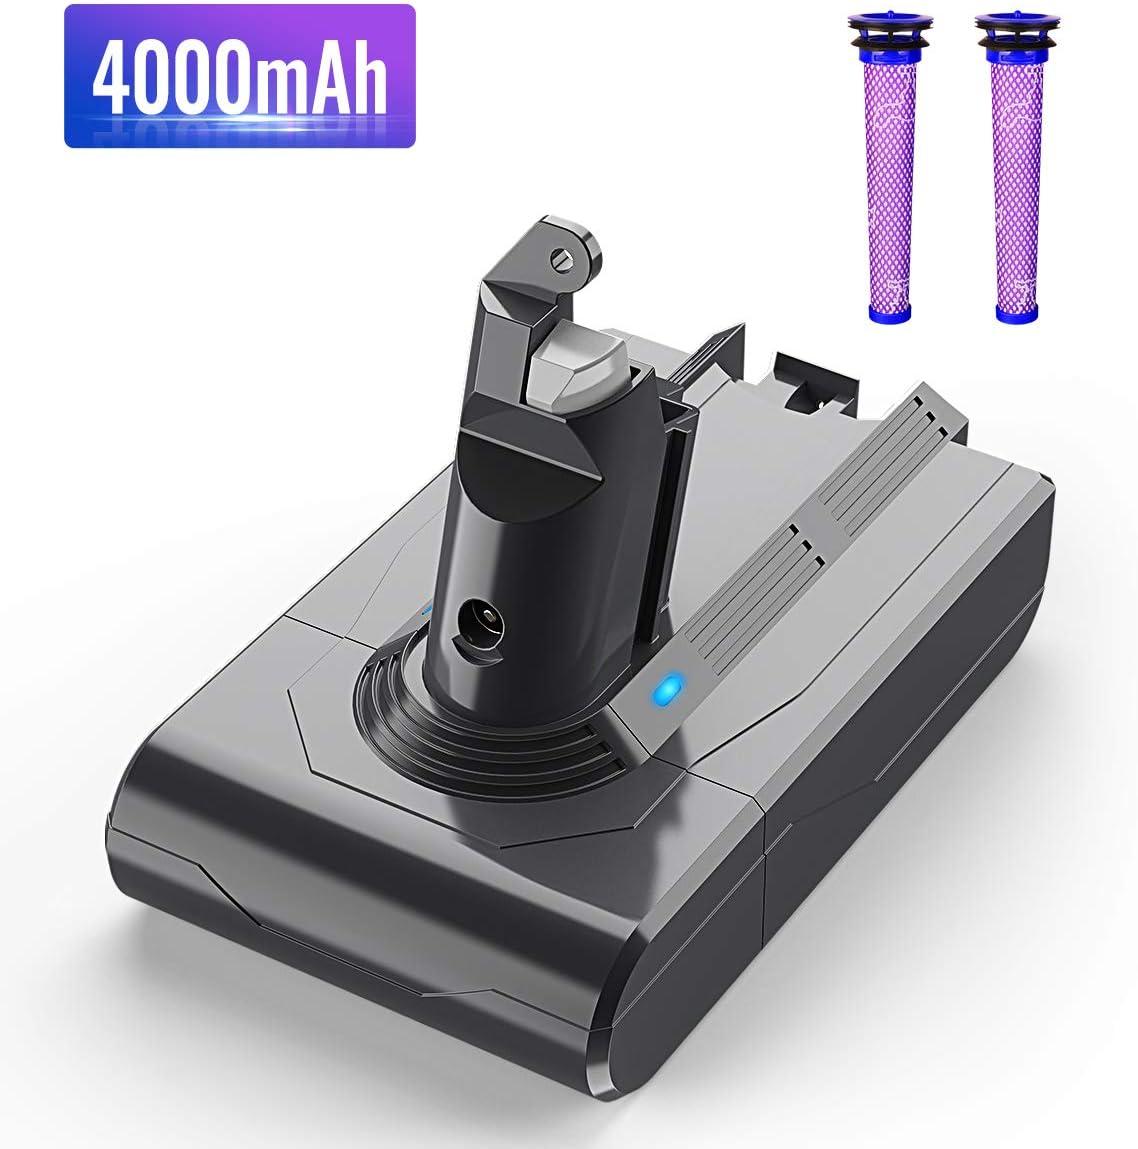 V6 Battery Replacement,BuTure 4000mAh 21.6V Li-ion Battery for DC59 Replacement Battery Compatible with DC58 DC61 DC62 Animal DC72 DC74 595 650 770 880